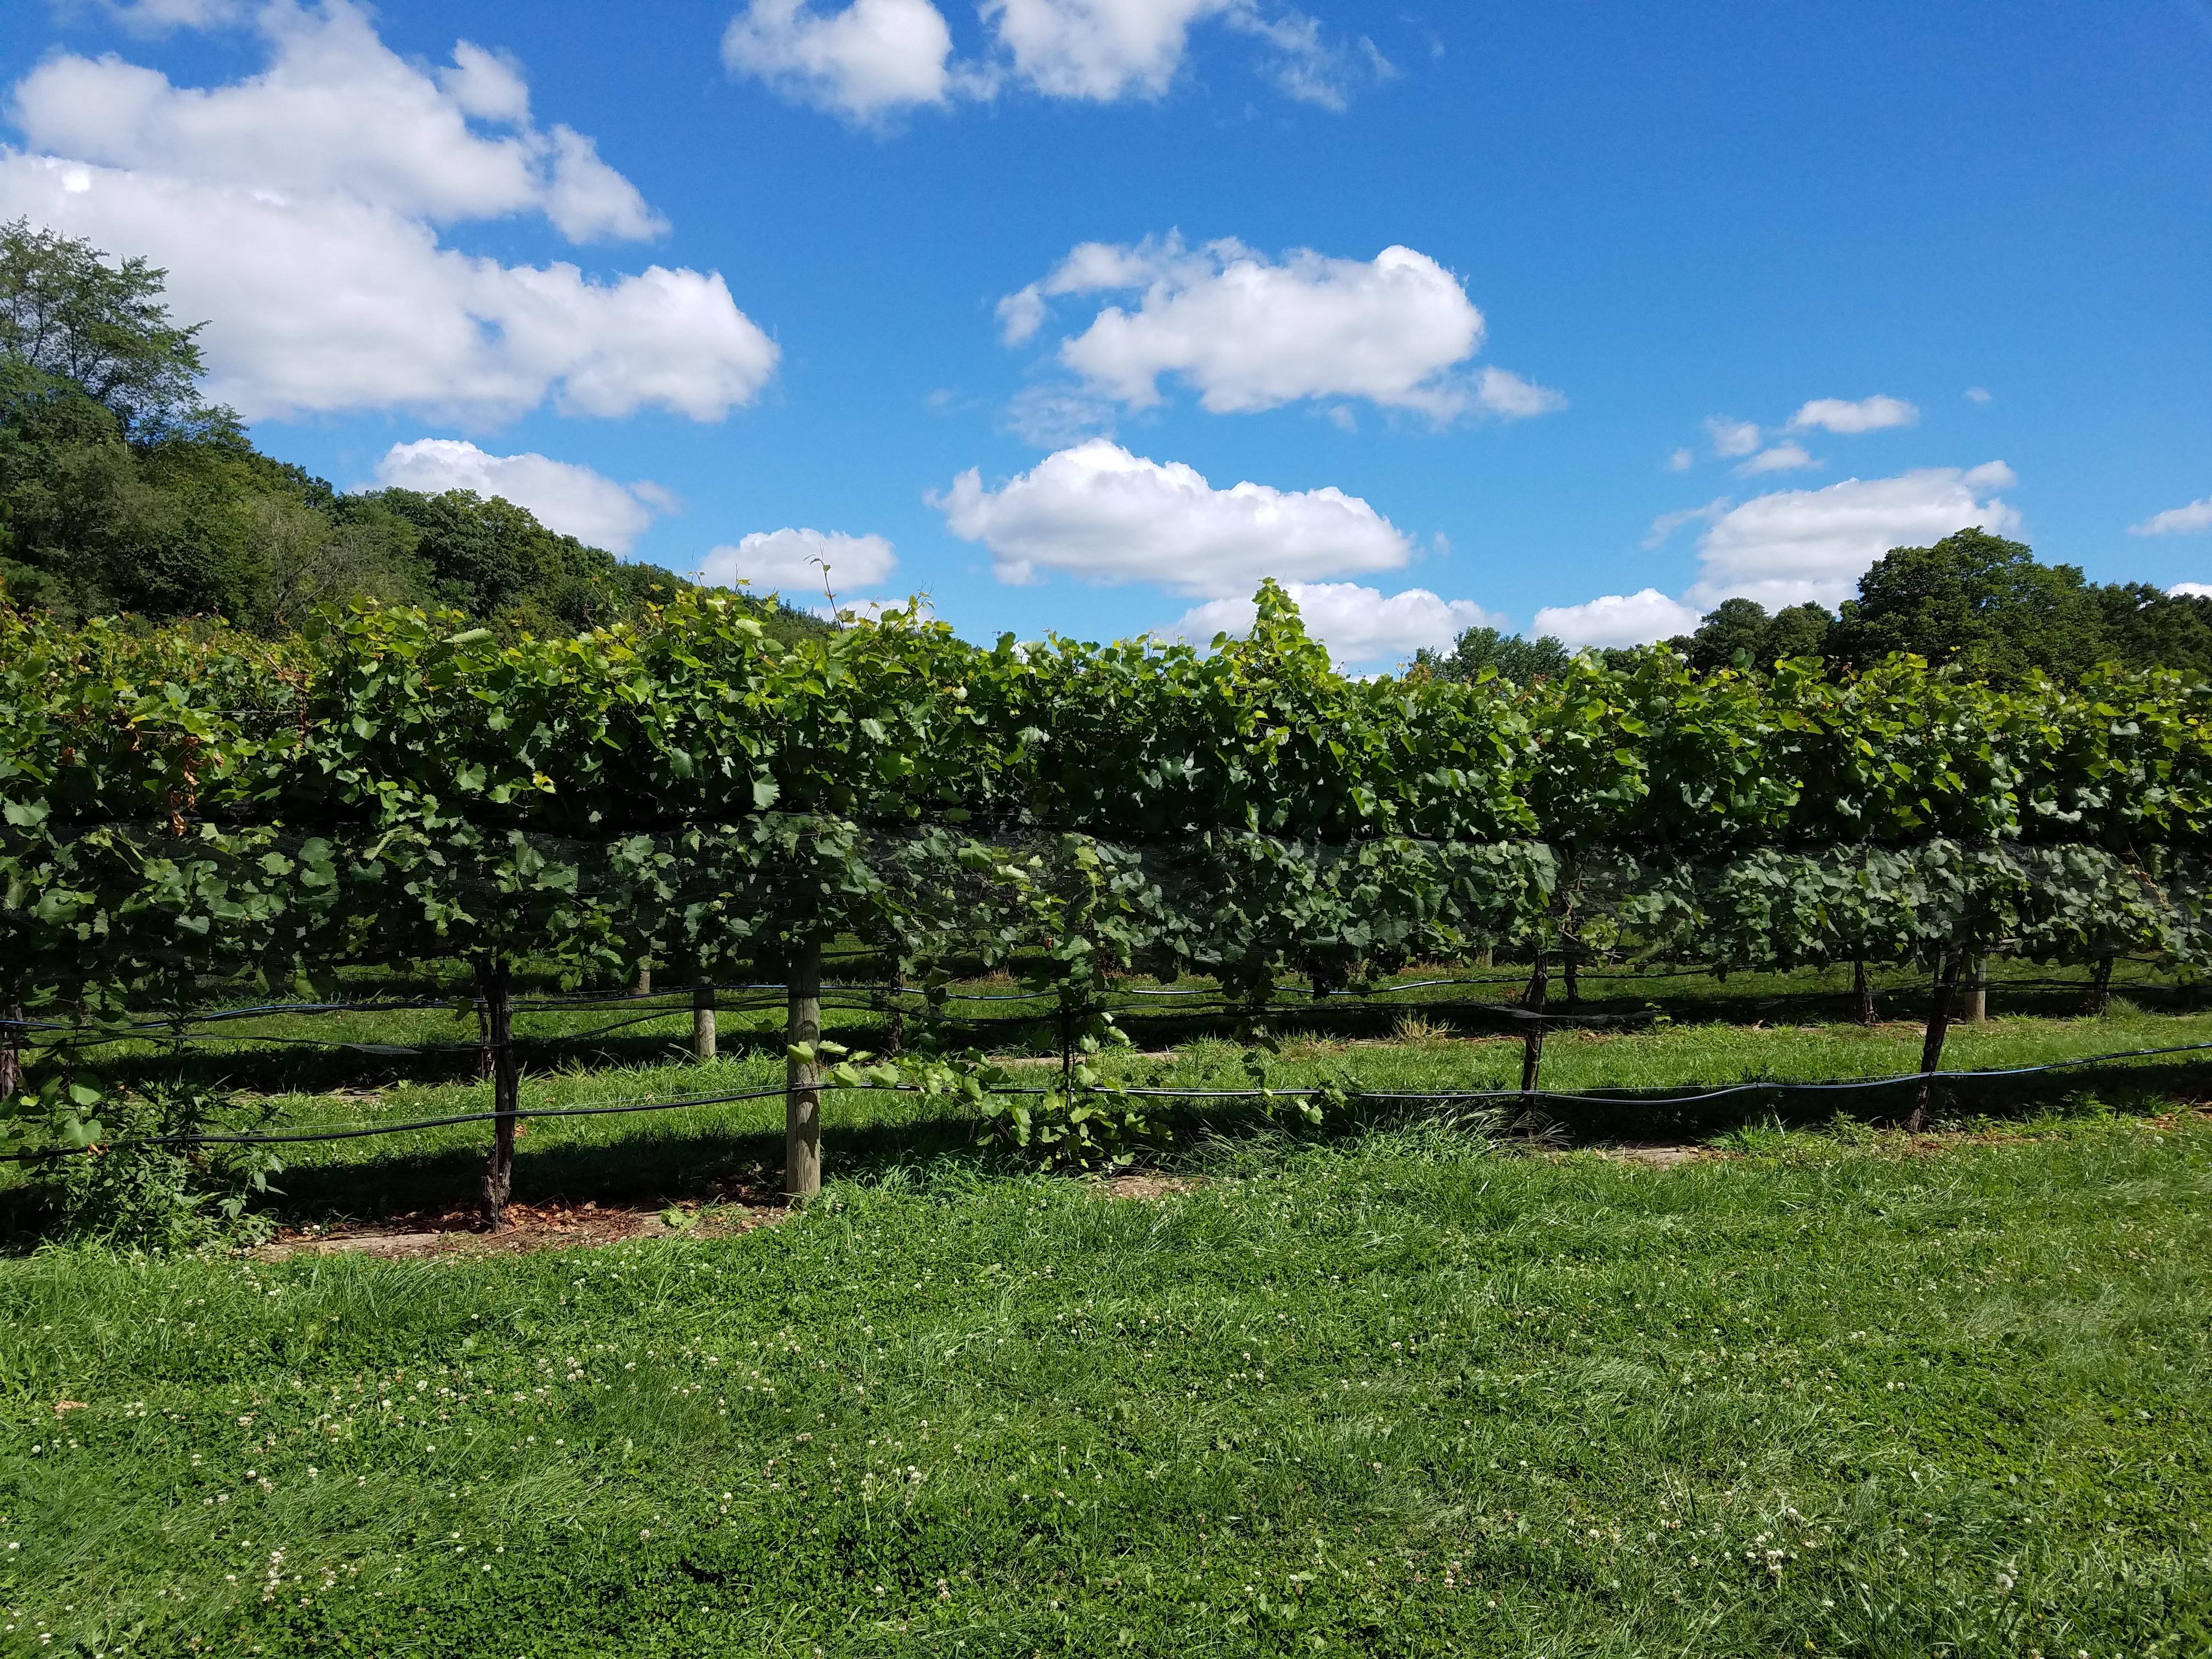 grape-vines-6077.jpg